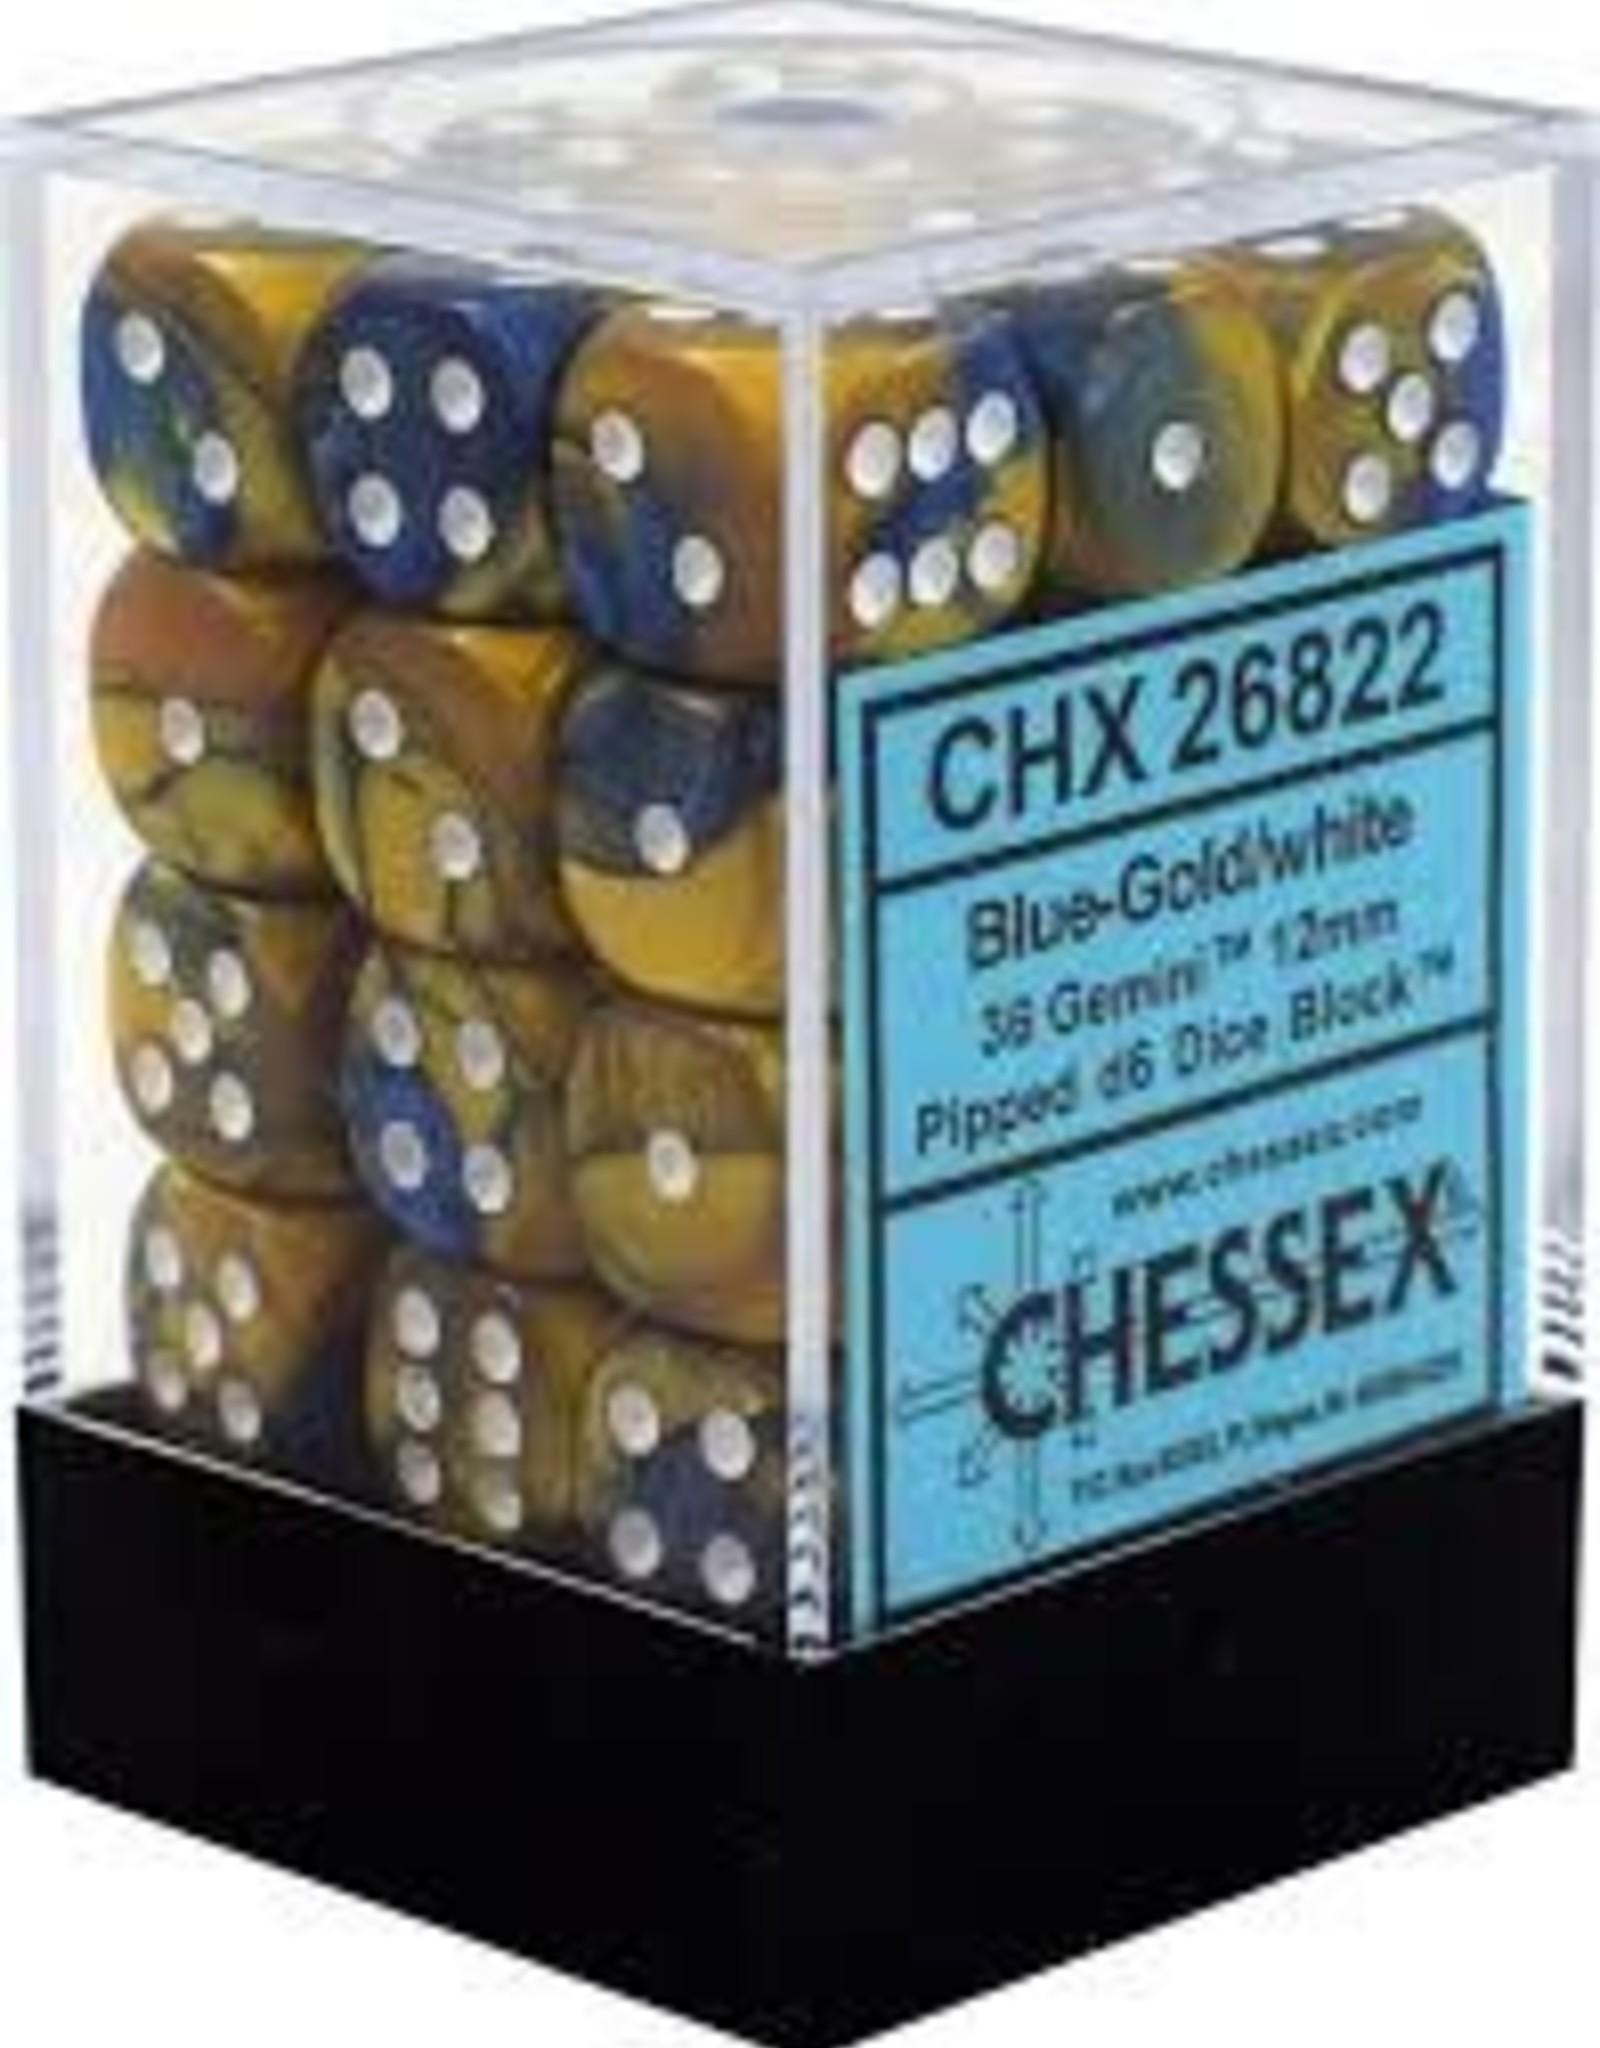 Chessex Chessex Gemini Blue Gold w/ White 12mm (Small) 36 Dice Set CHX26822